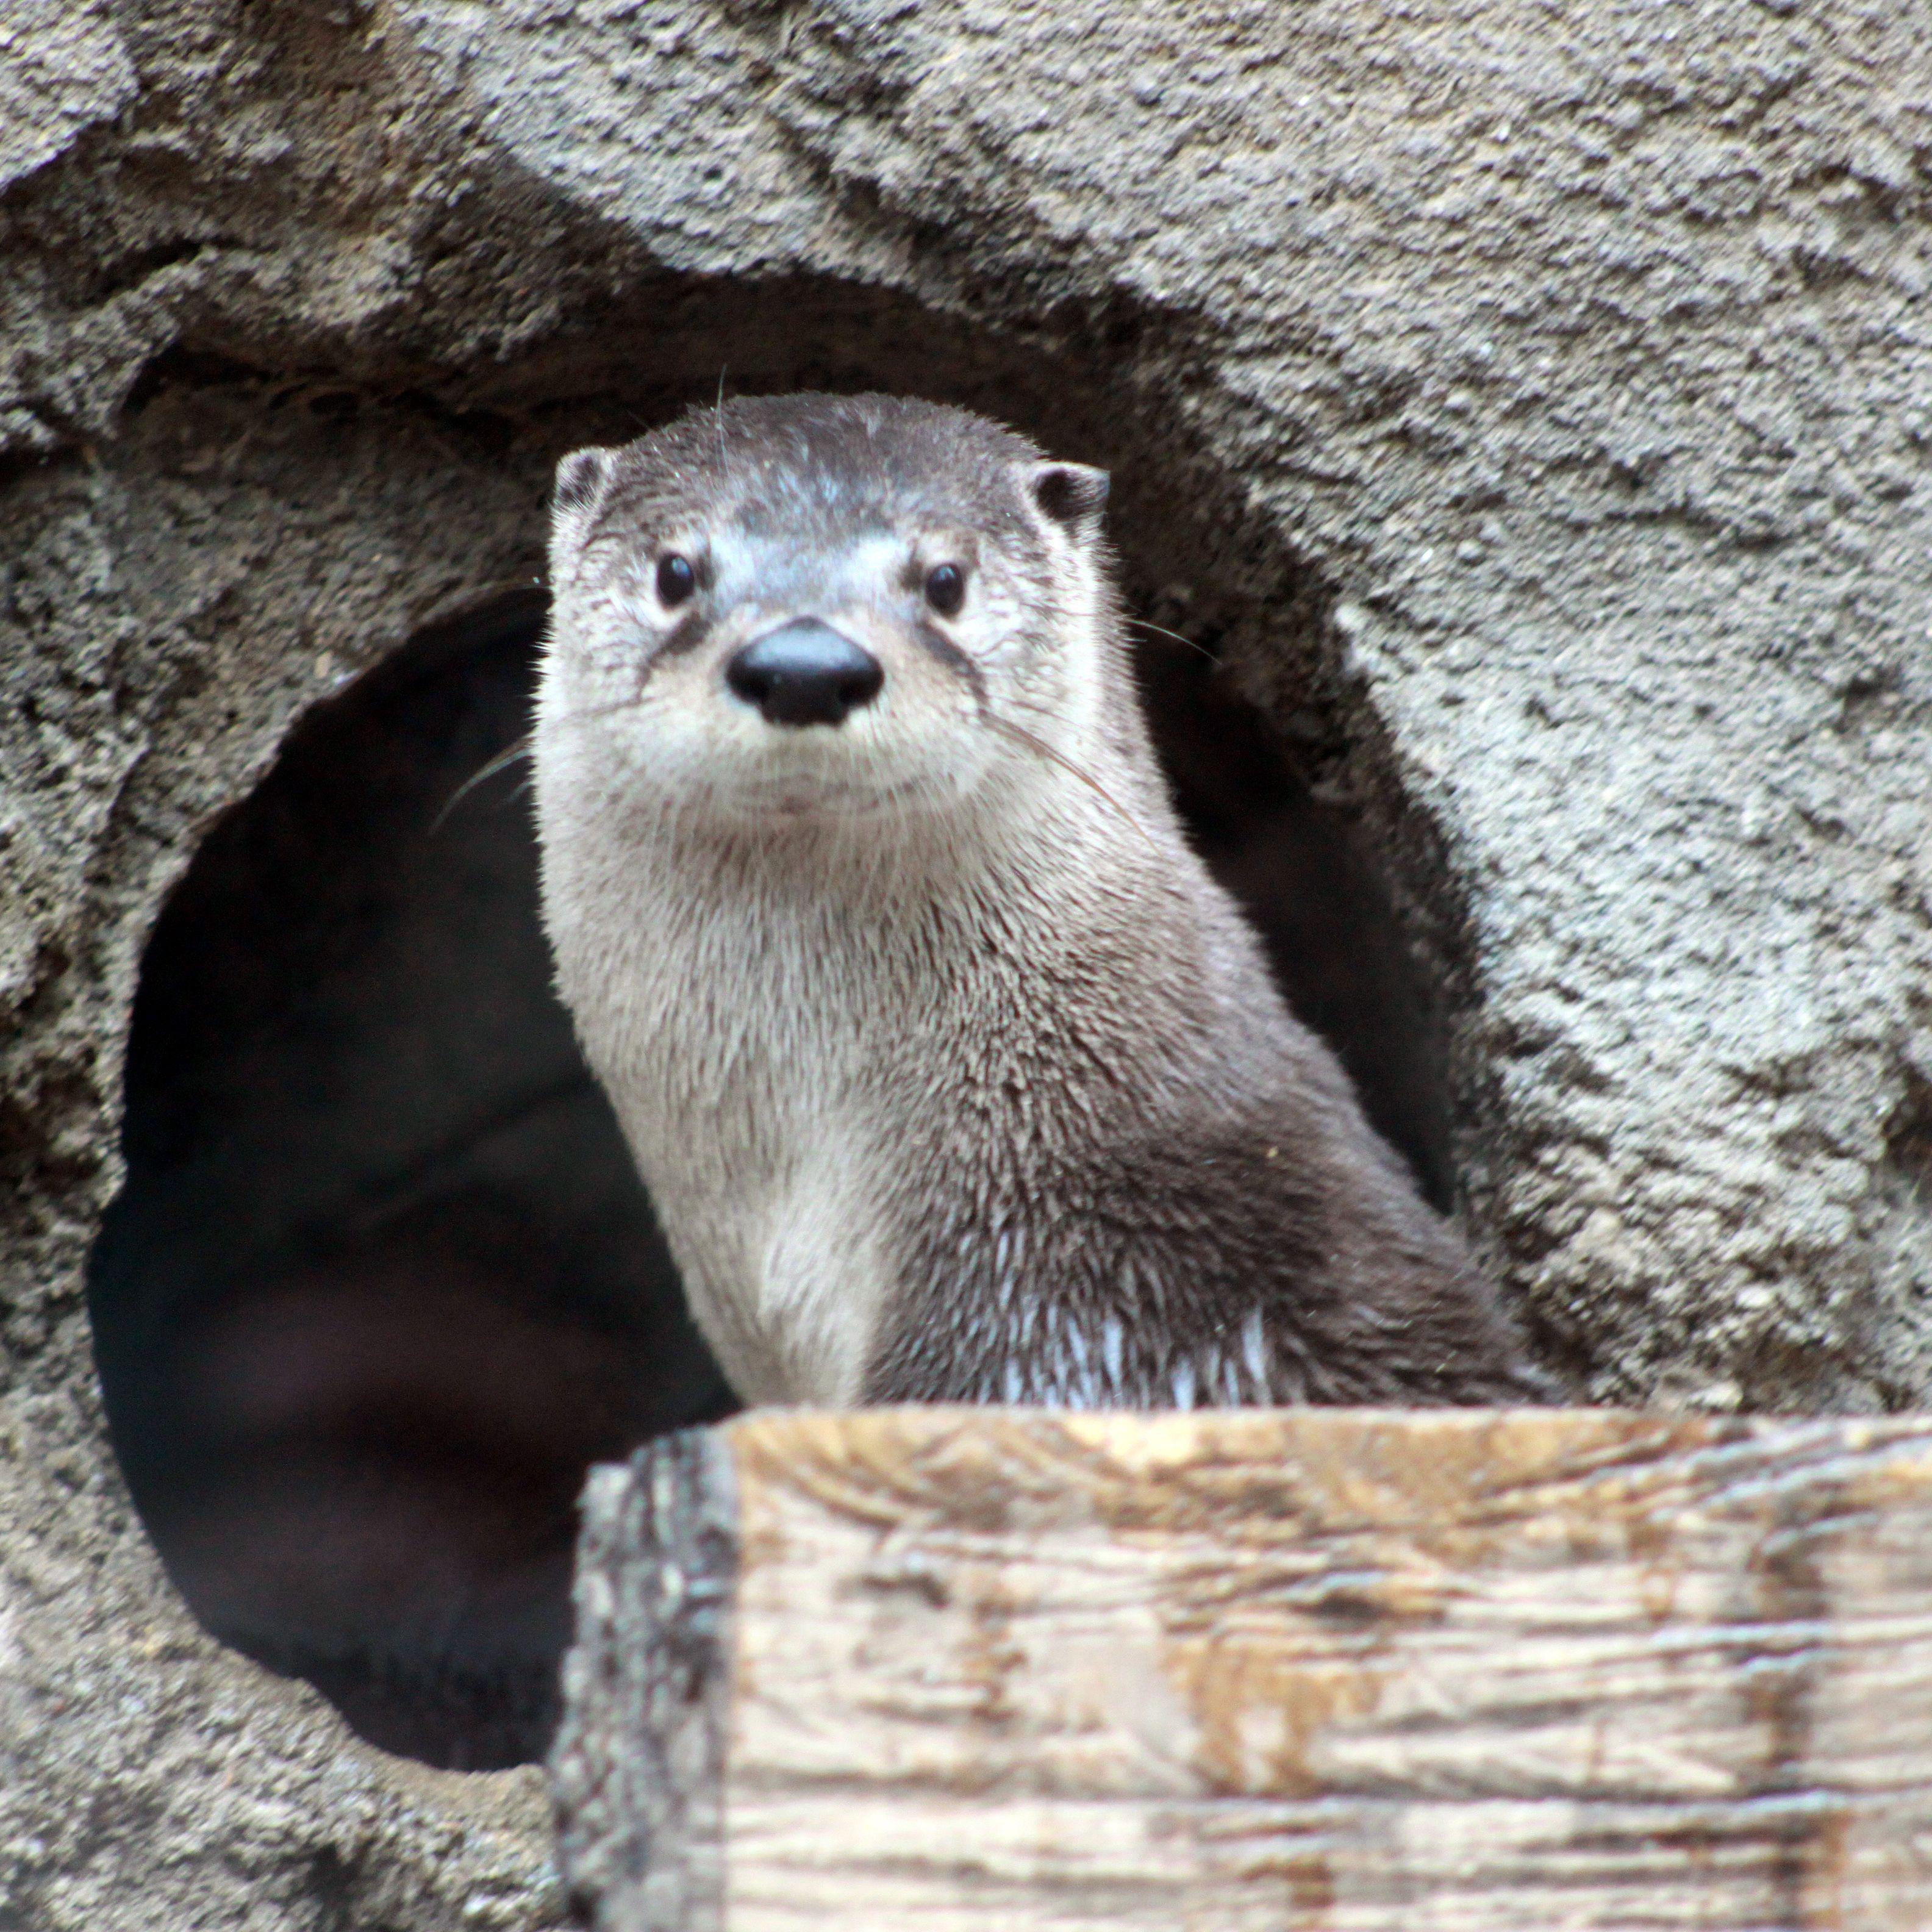 Richard the Otter